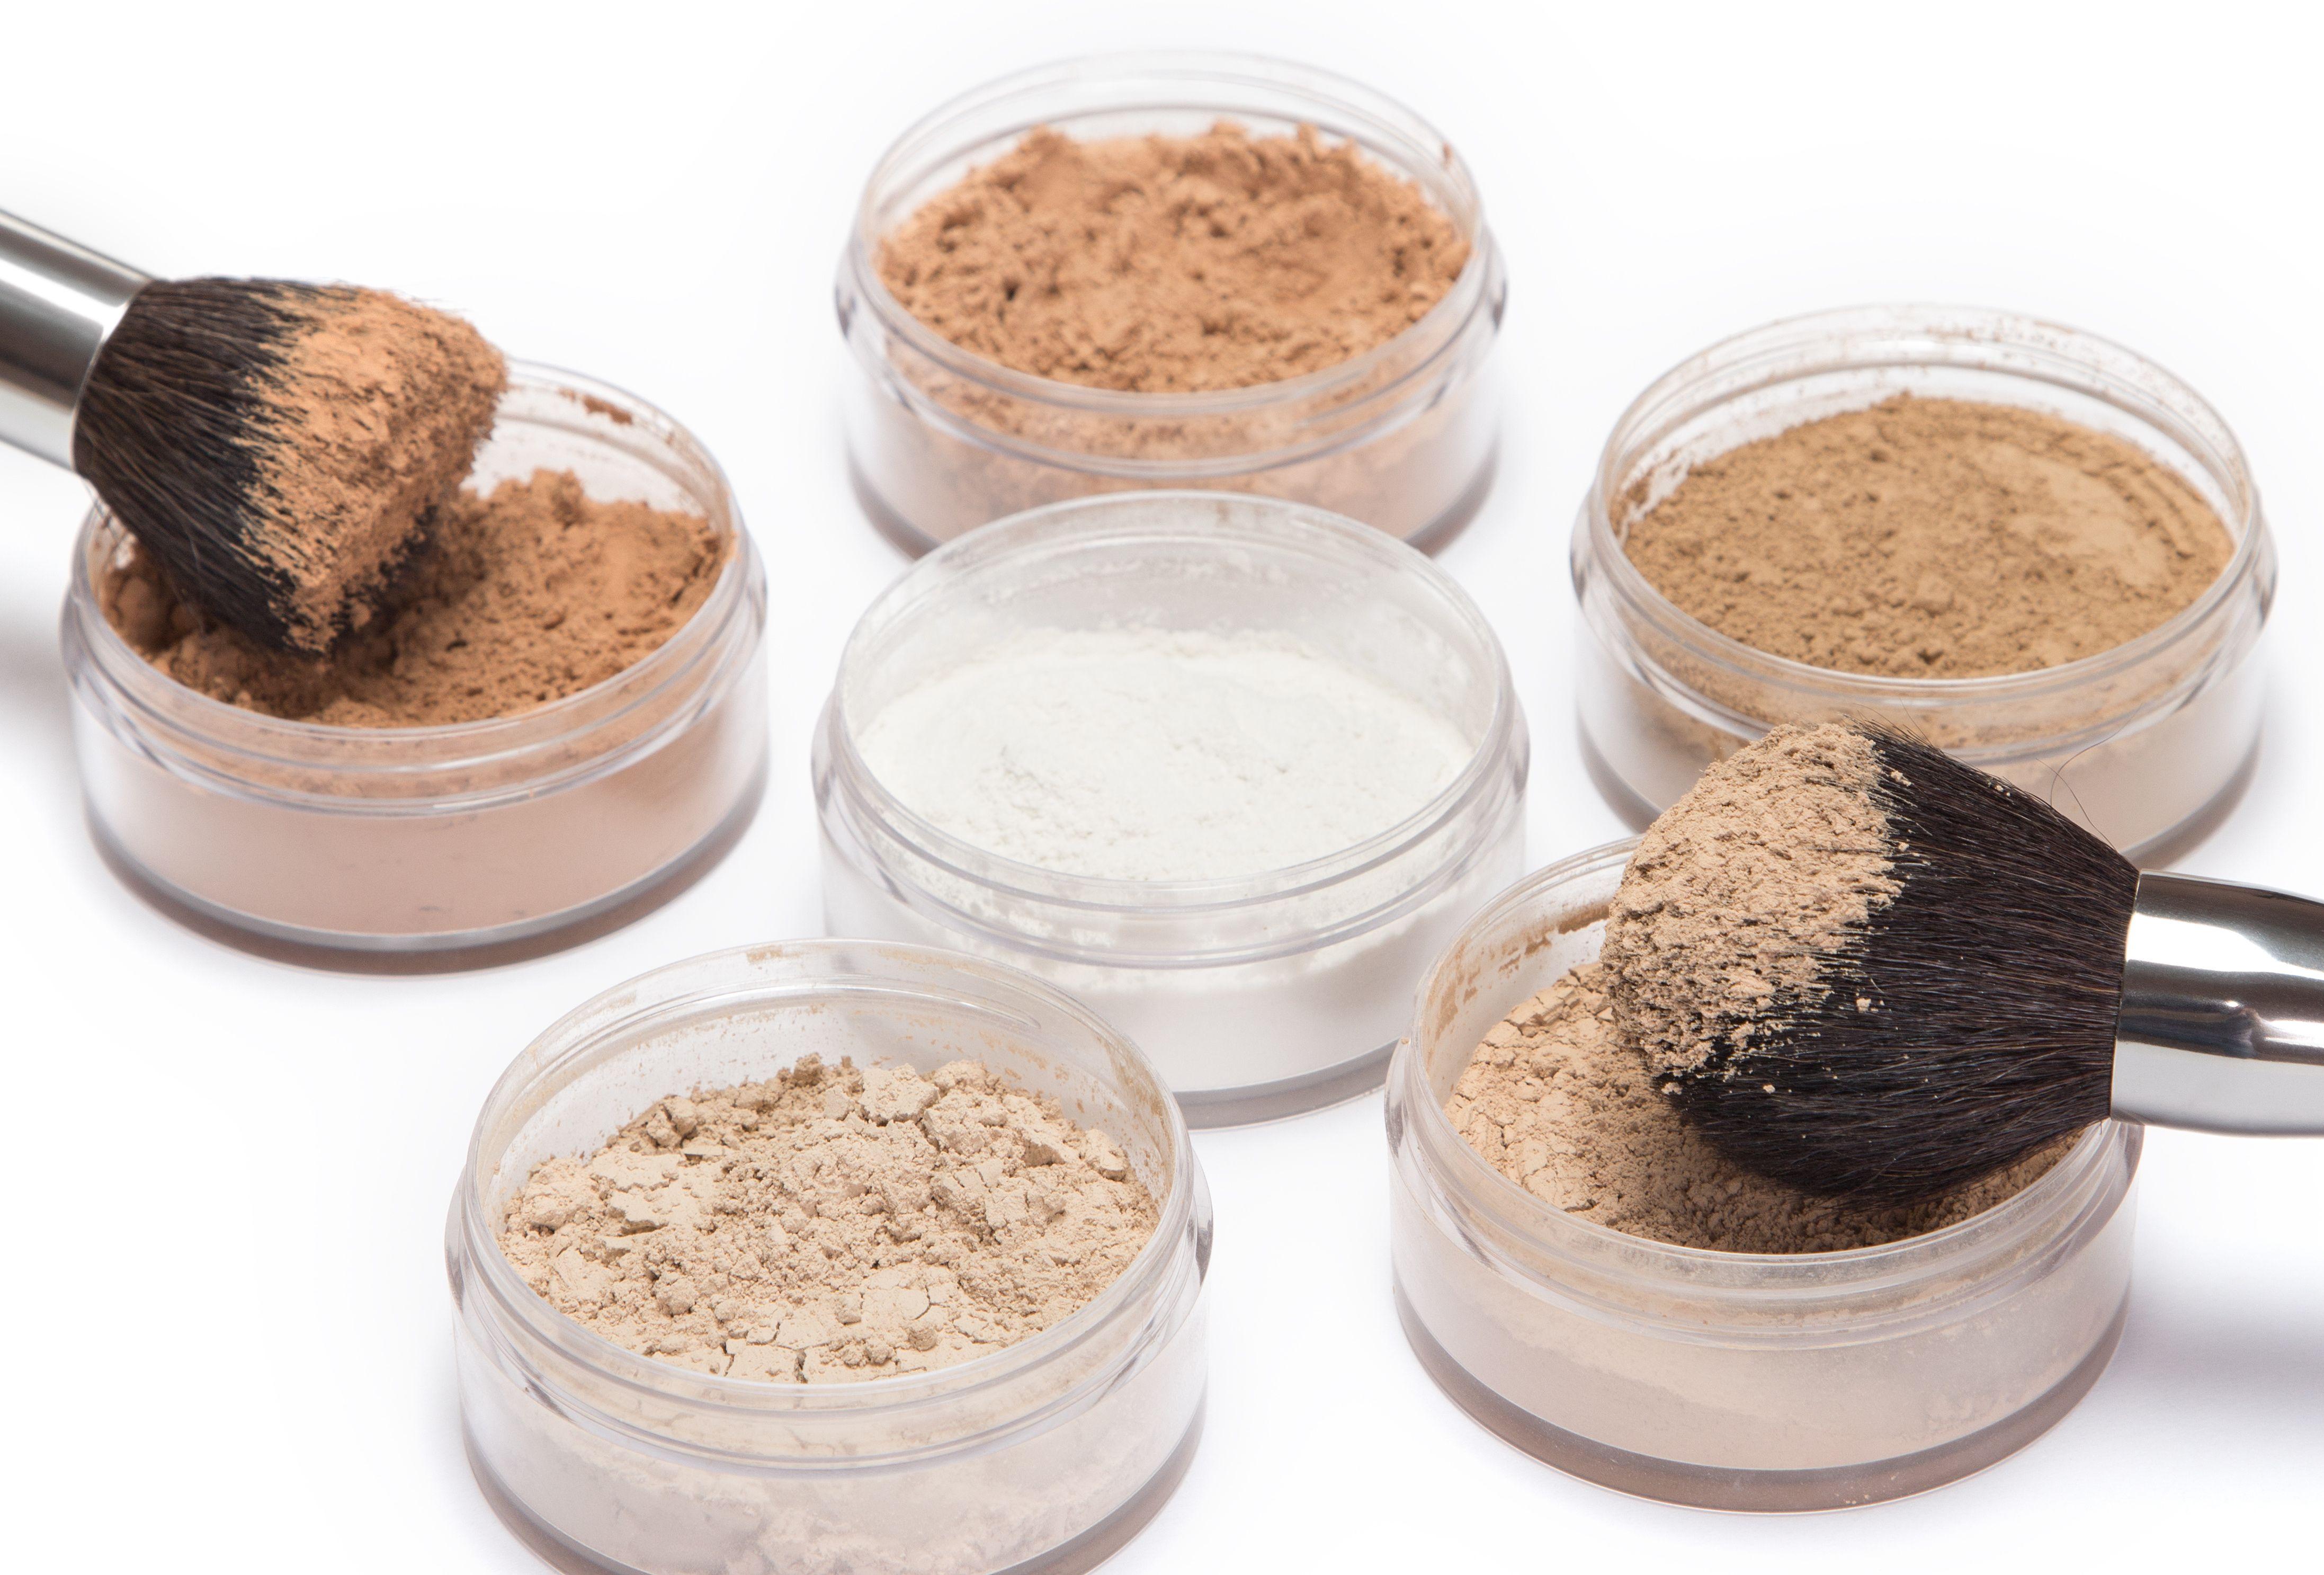 DIY Natural Loose Powder Foundation Recipe Diy